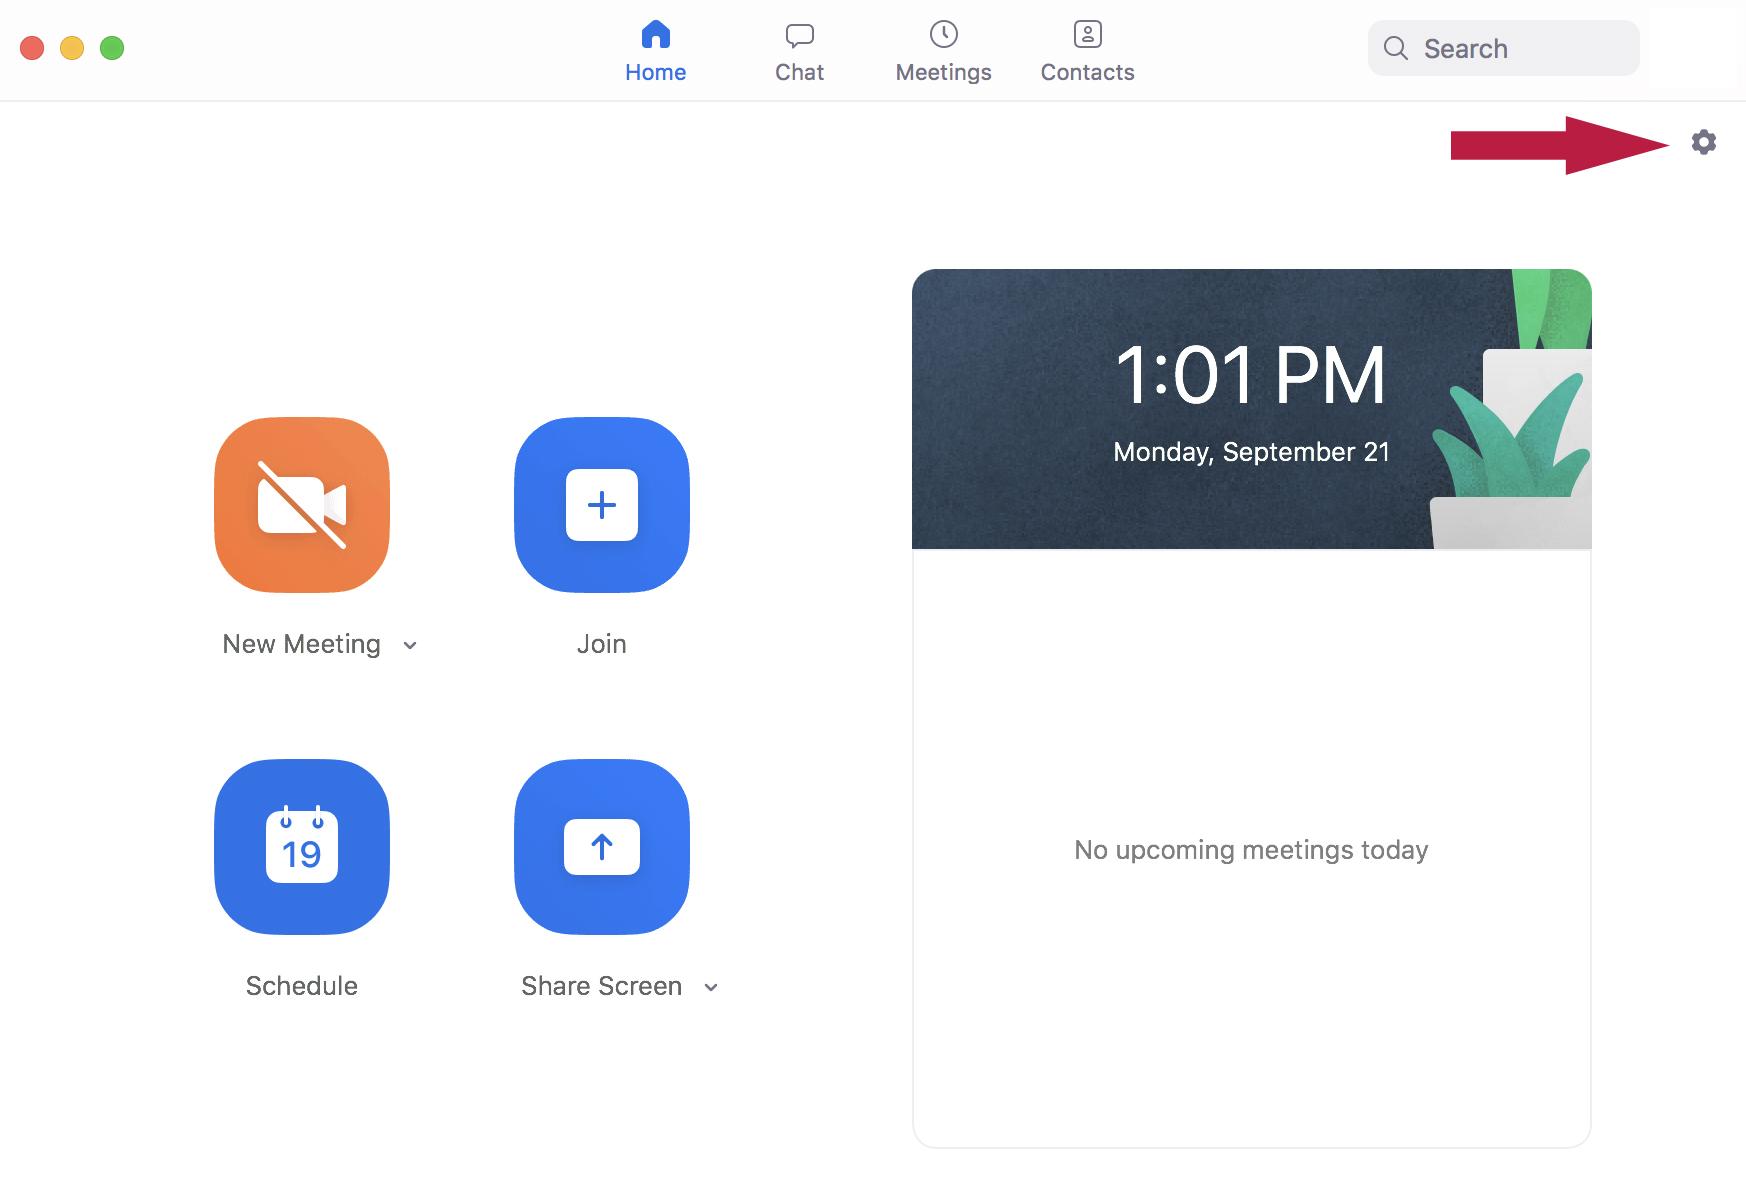 Screenshot of Zoom home screen